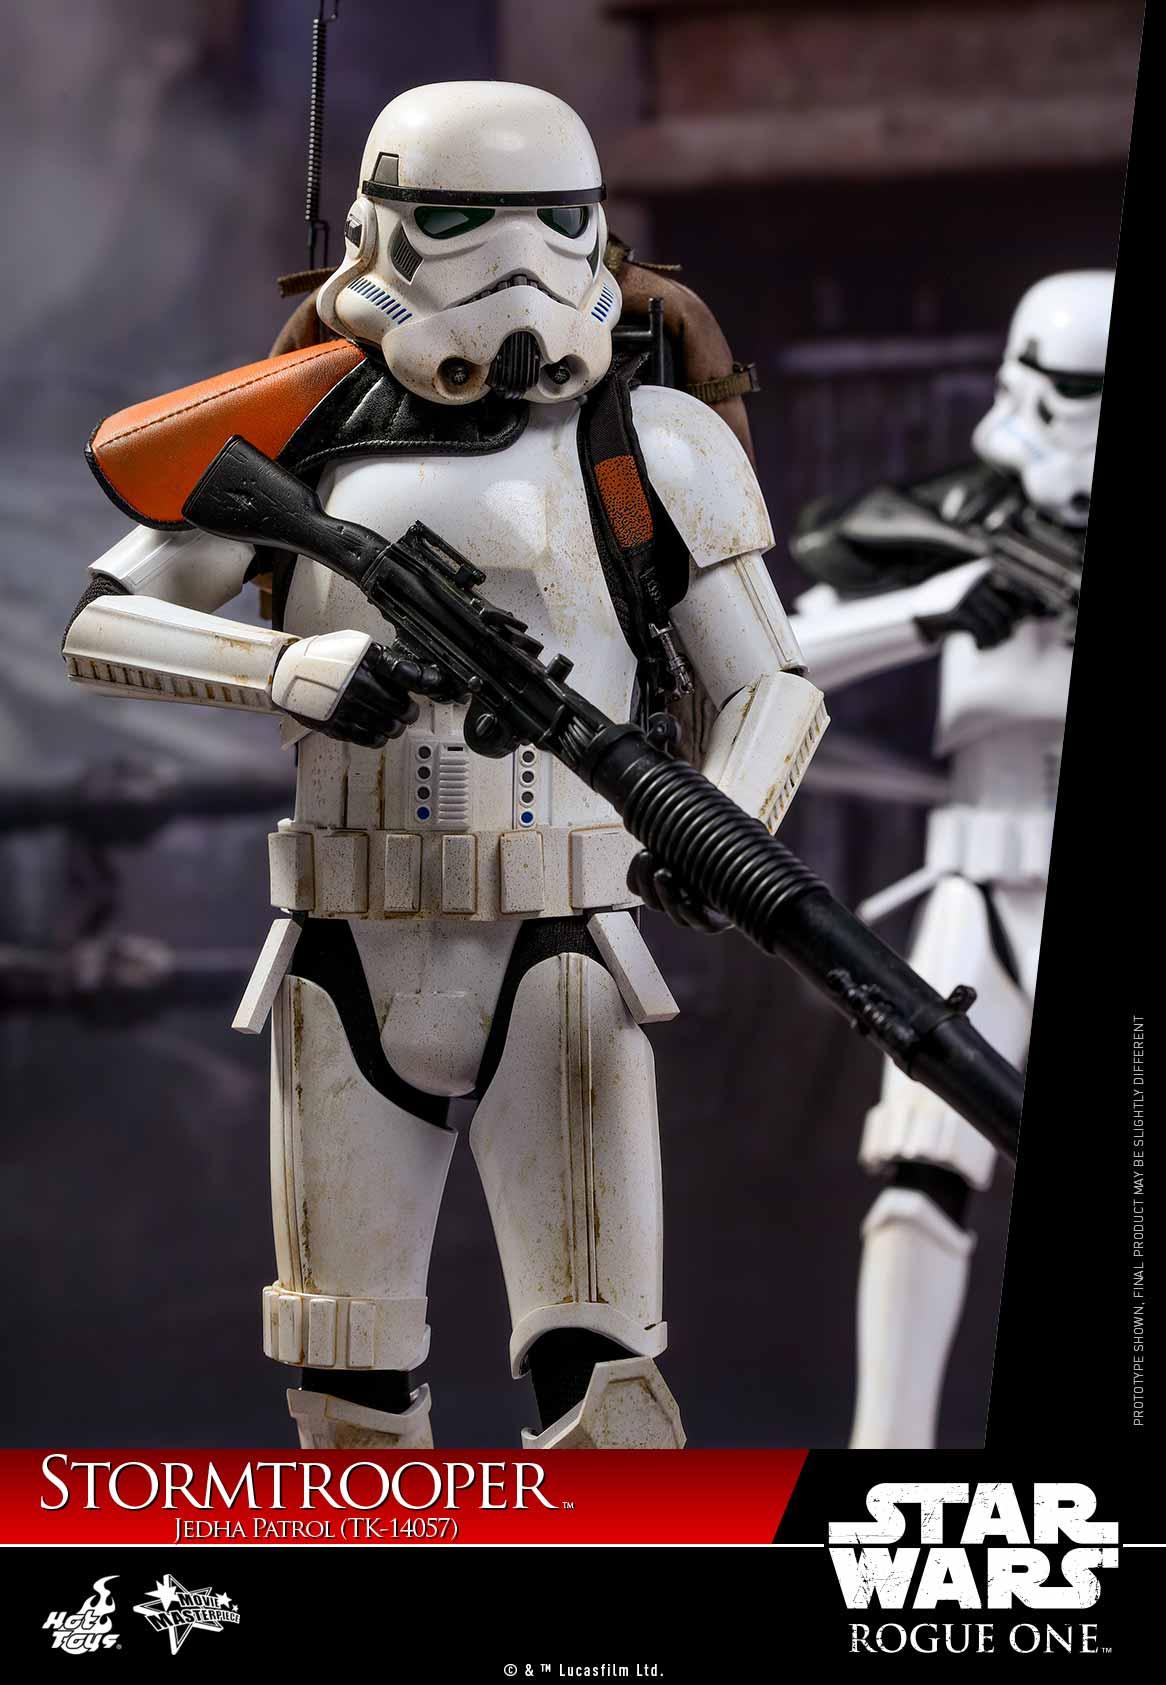 hot-toys-swro-stormtrooper-jedha-patrol-tk-14057-collectible-figure_pr1